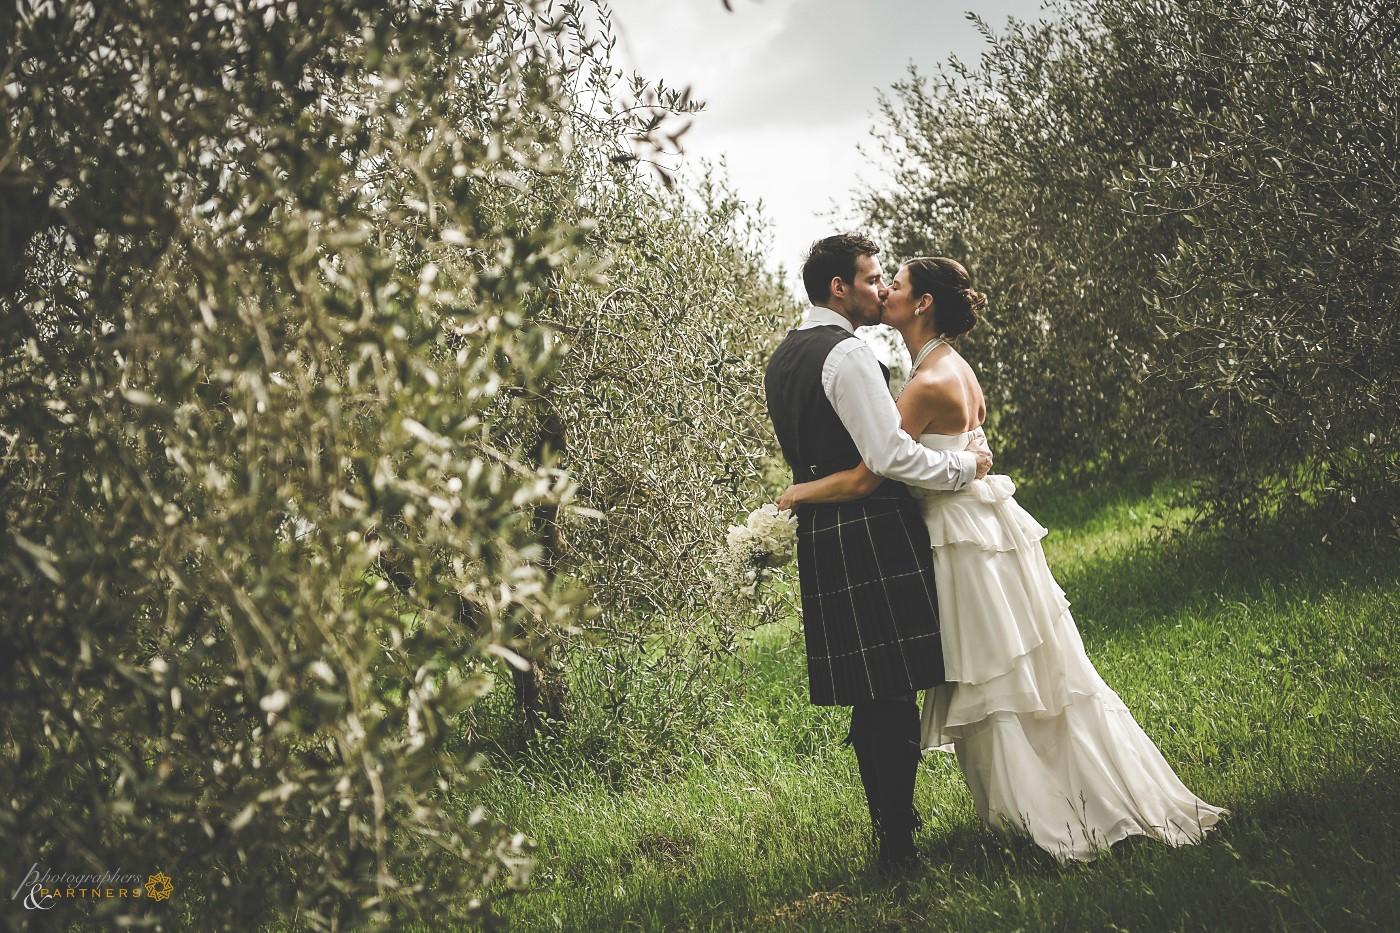 photographer_wedding_pisa_15.1.jpg